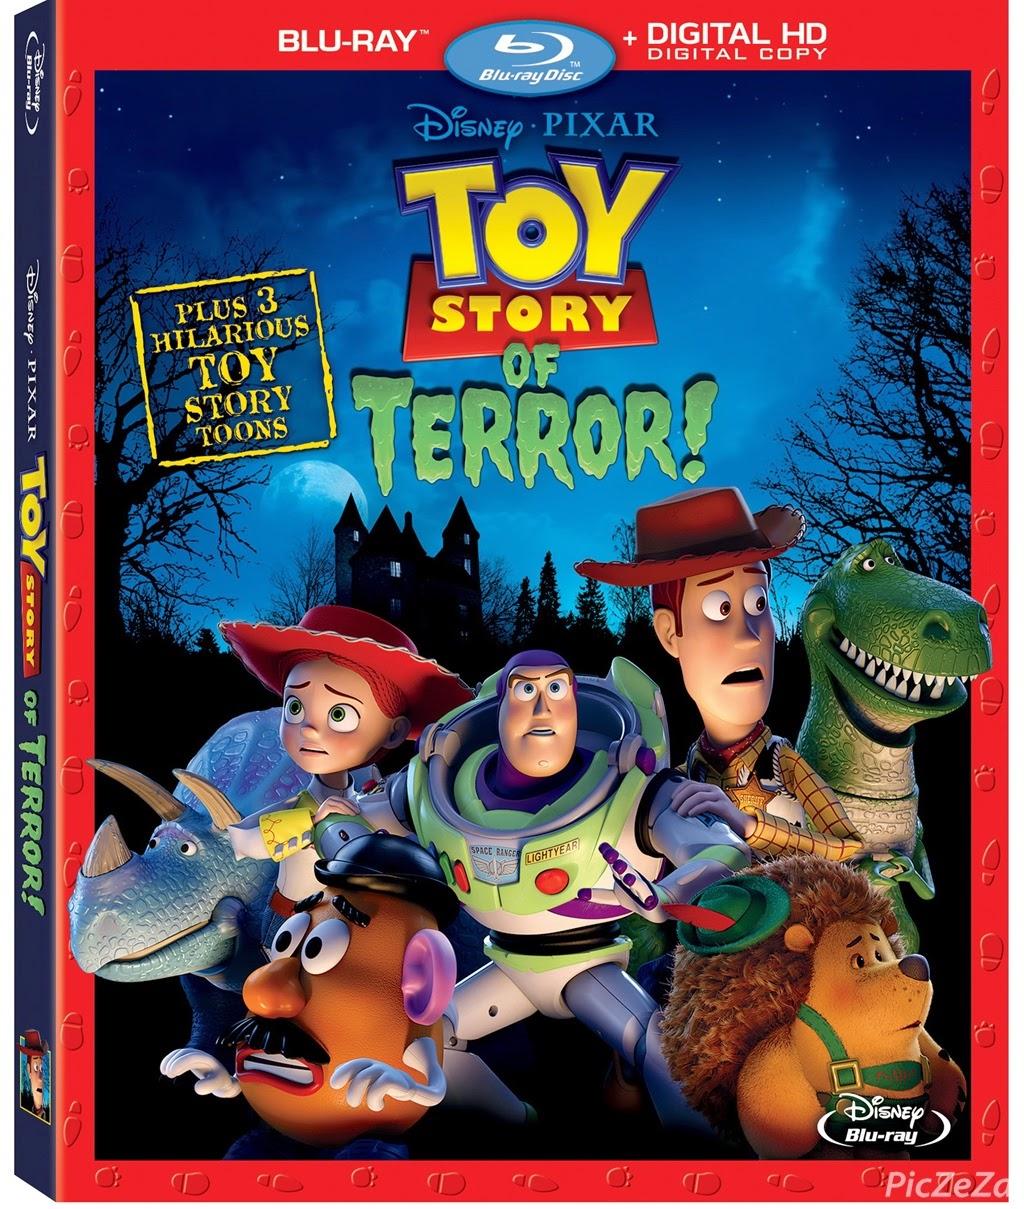 Toy Story of Terror (2013) ทอยสตอรี่ ตอนพิเศษ หนังสยองขวัญ Full HD มาสเตอร์ พากย์ไทย